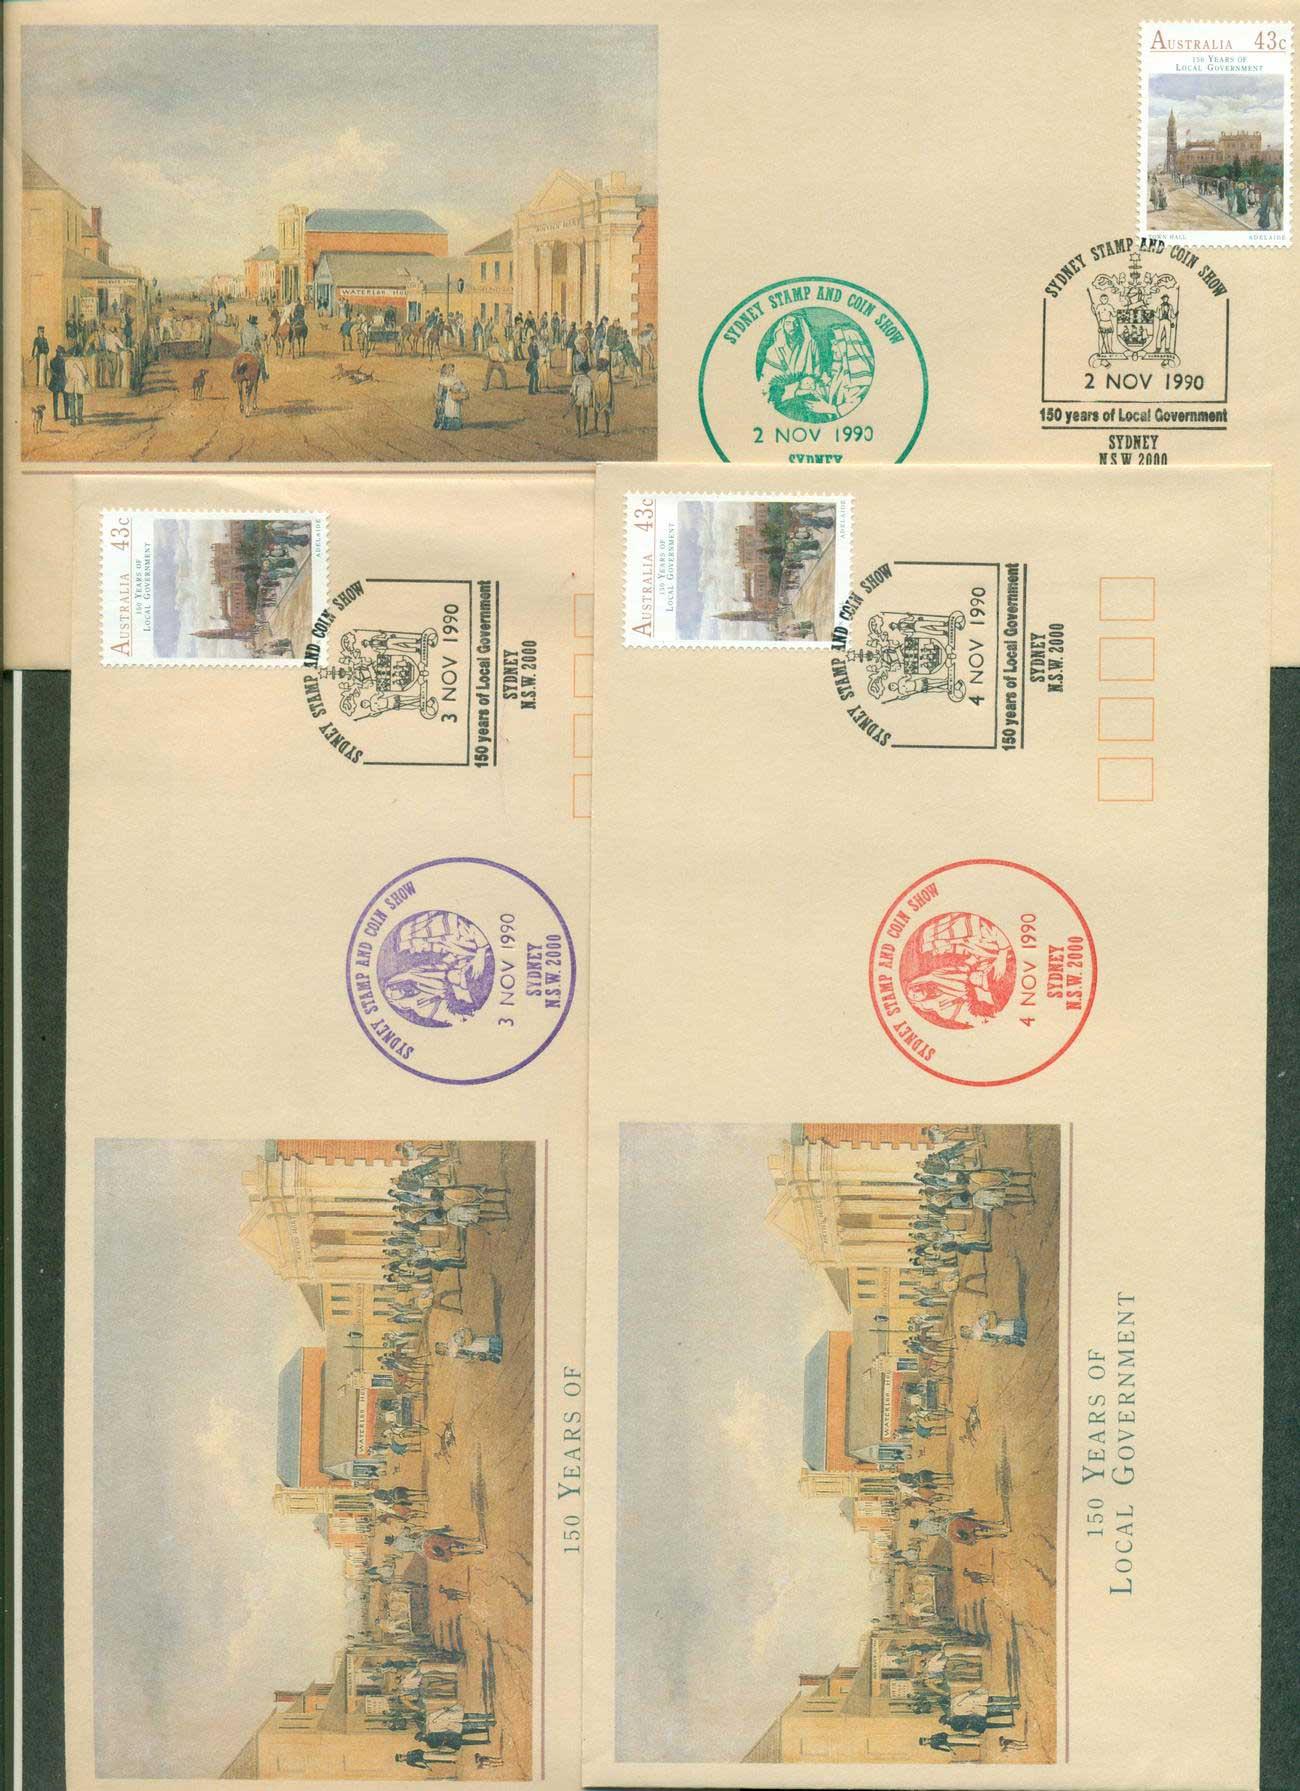 stamp collectors sydney australia time - photo#21